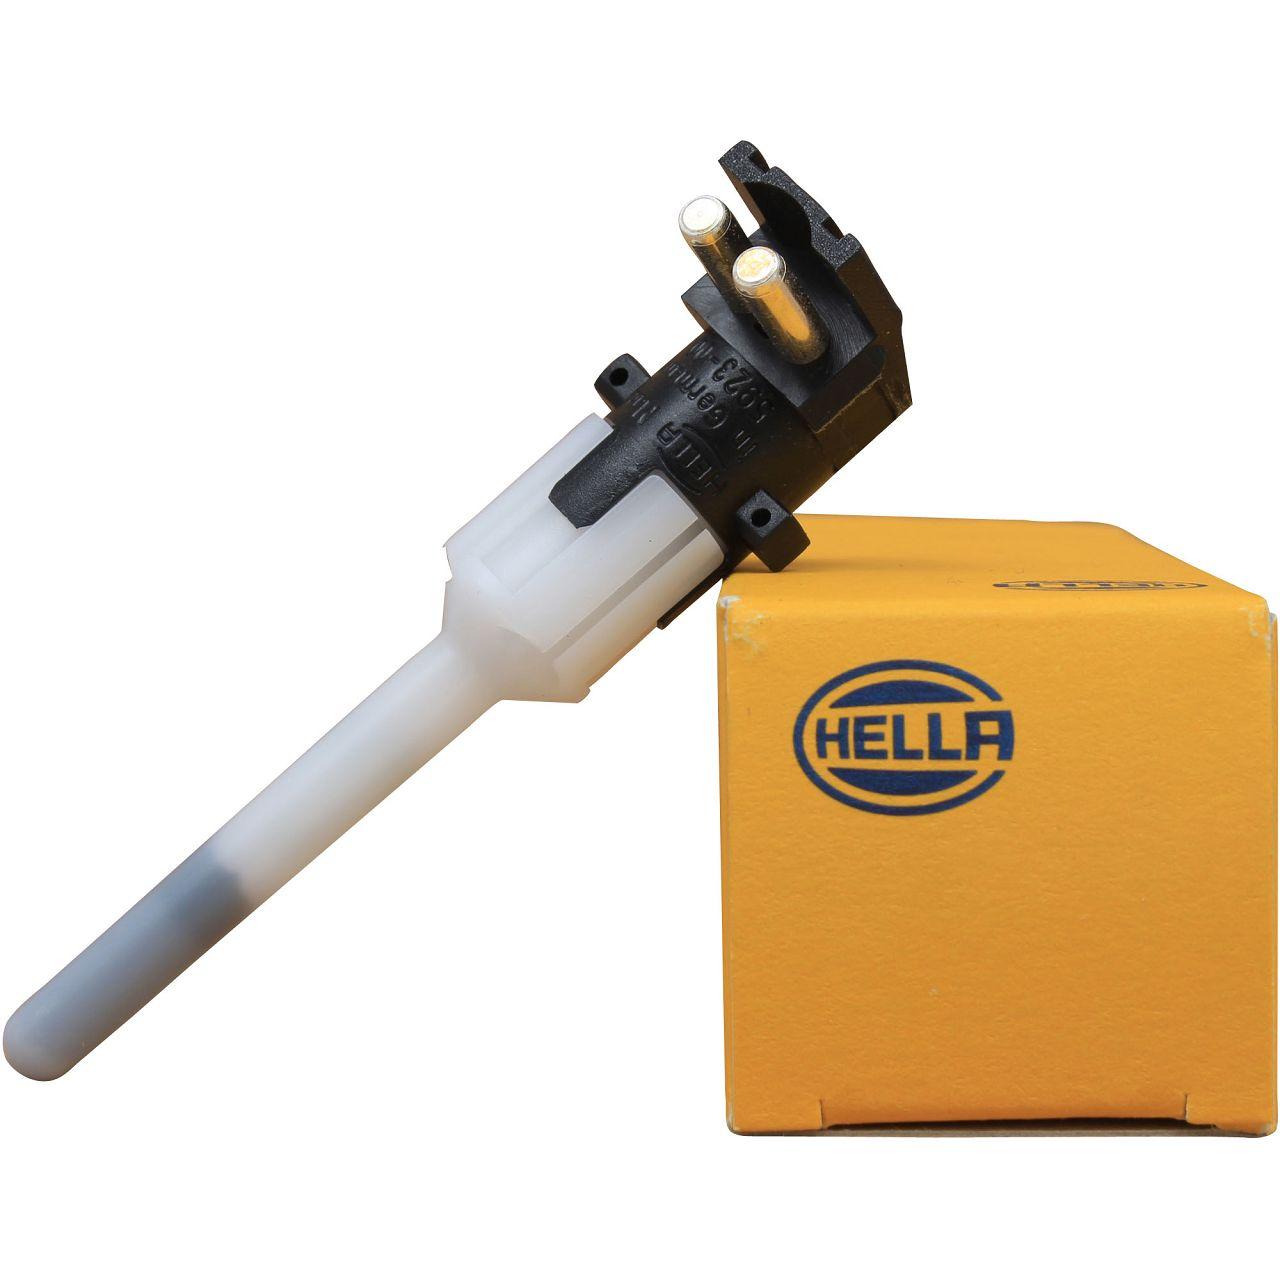 HELLA Kühlmittelstandssensor MERCEDES W202 W210 W140 R129 Sprinter V-Klasse Vito